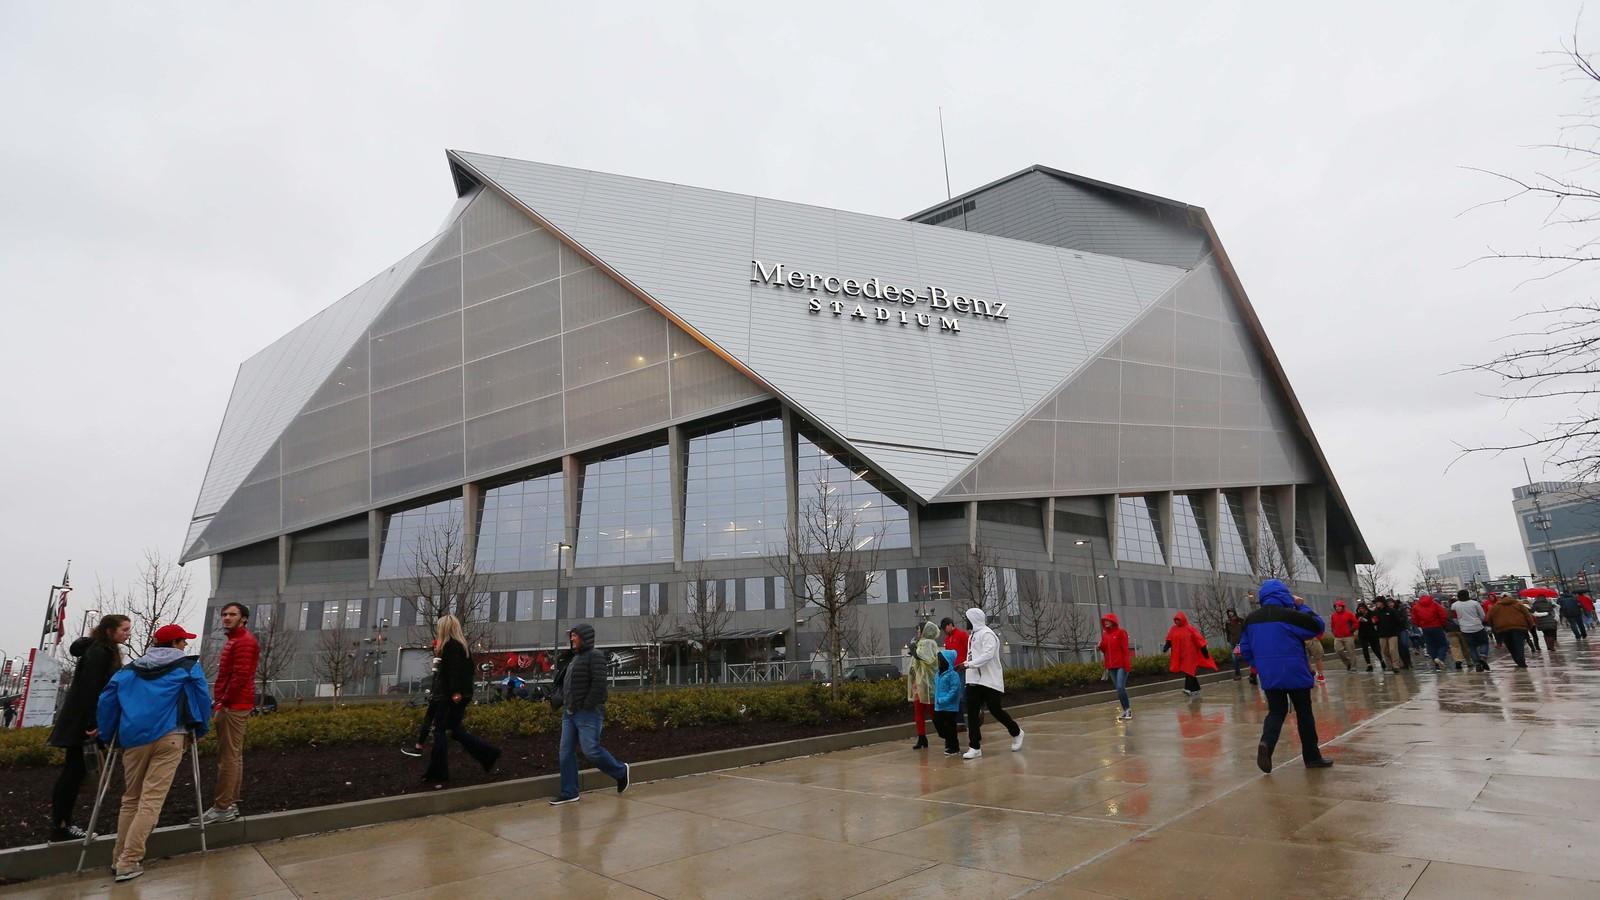 Mercedes benz stadium roof leaking before cfp title game for Mercedes benz stadium roof